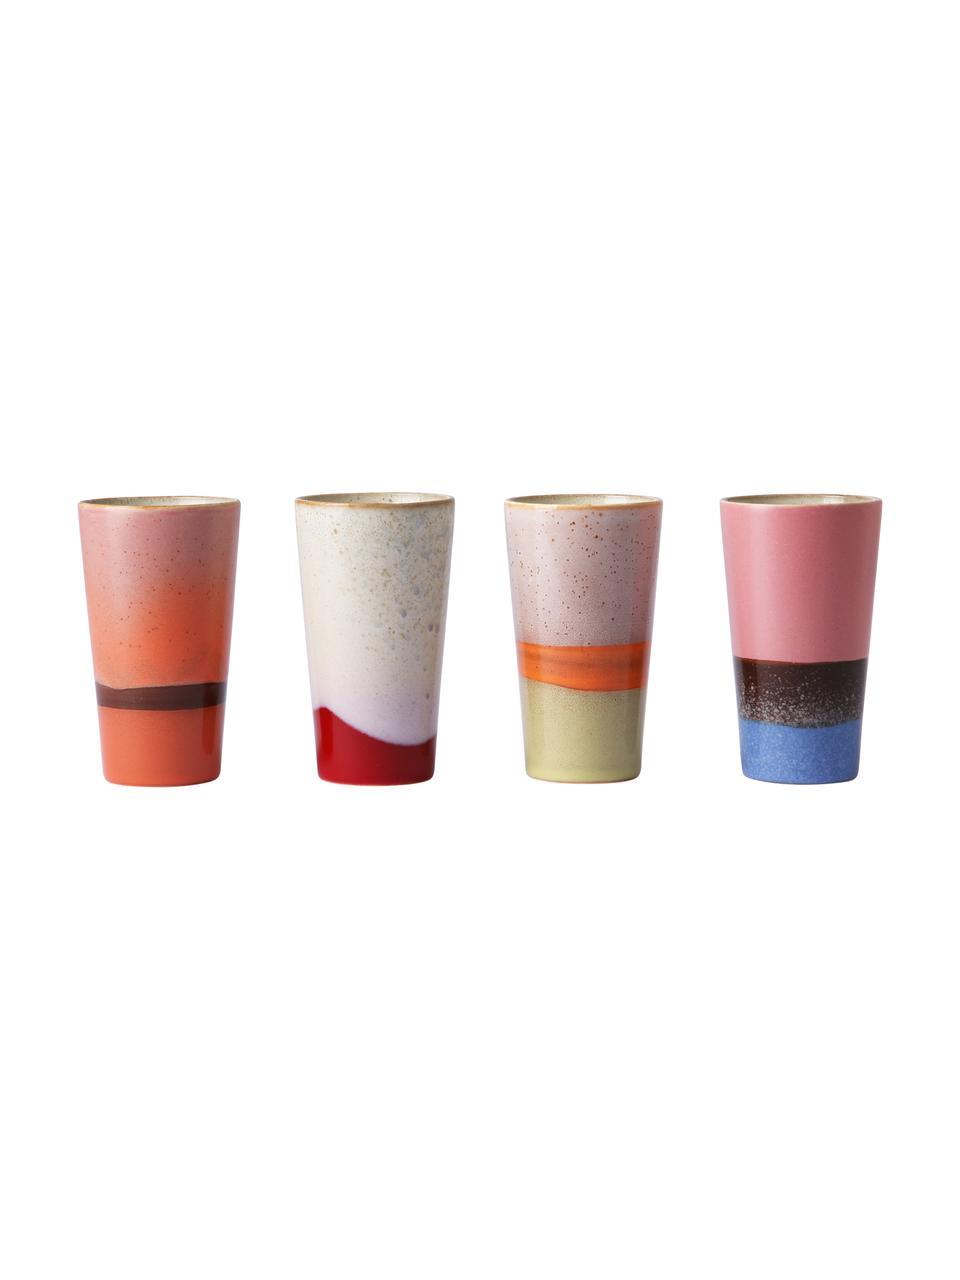 Handgemaakte bekersset 70's in retro stijl, 4-delig, Keramiek, Multicolour, Ø 8 x H 13 cm